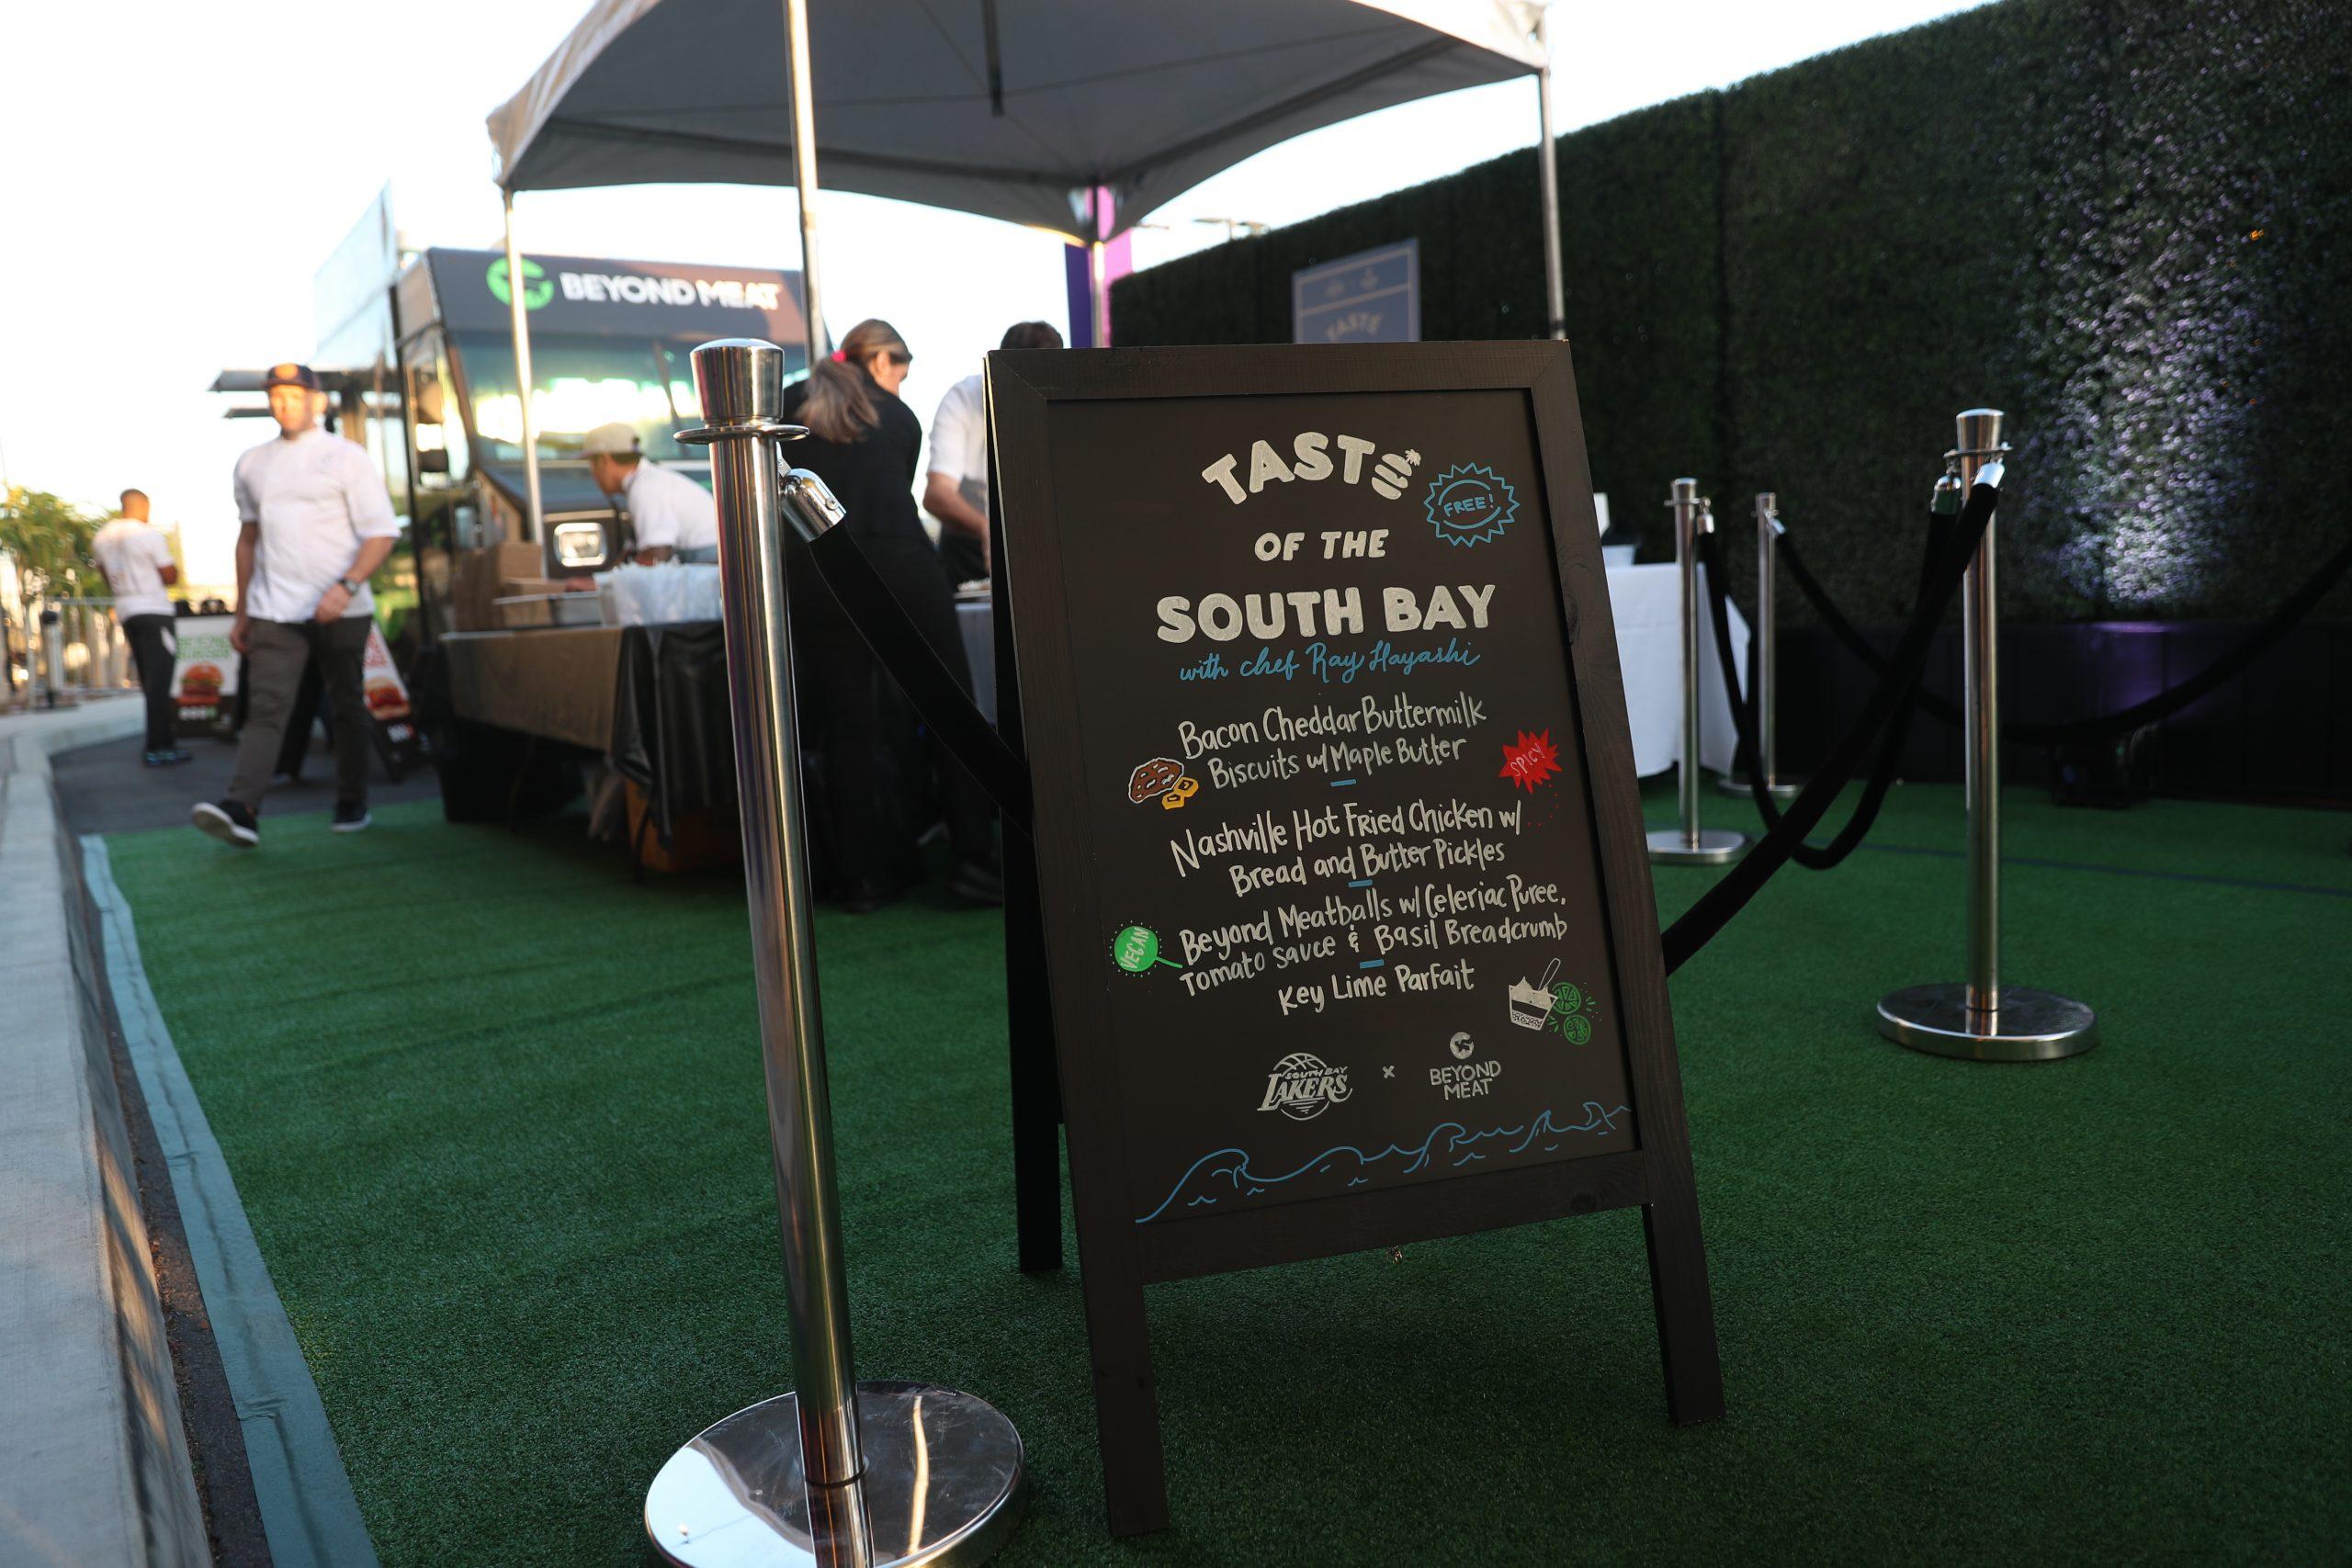 Taste of the South Bay